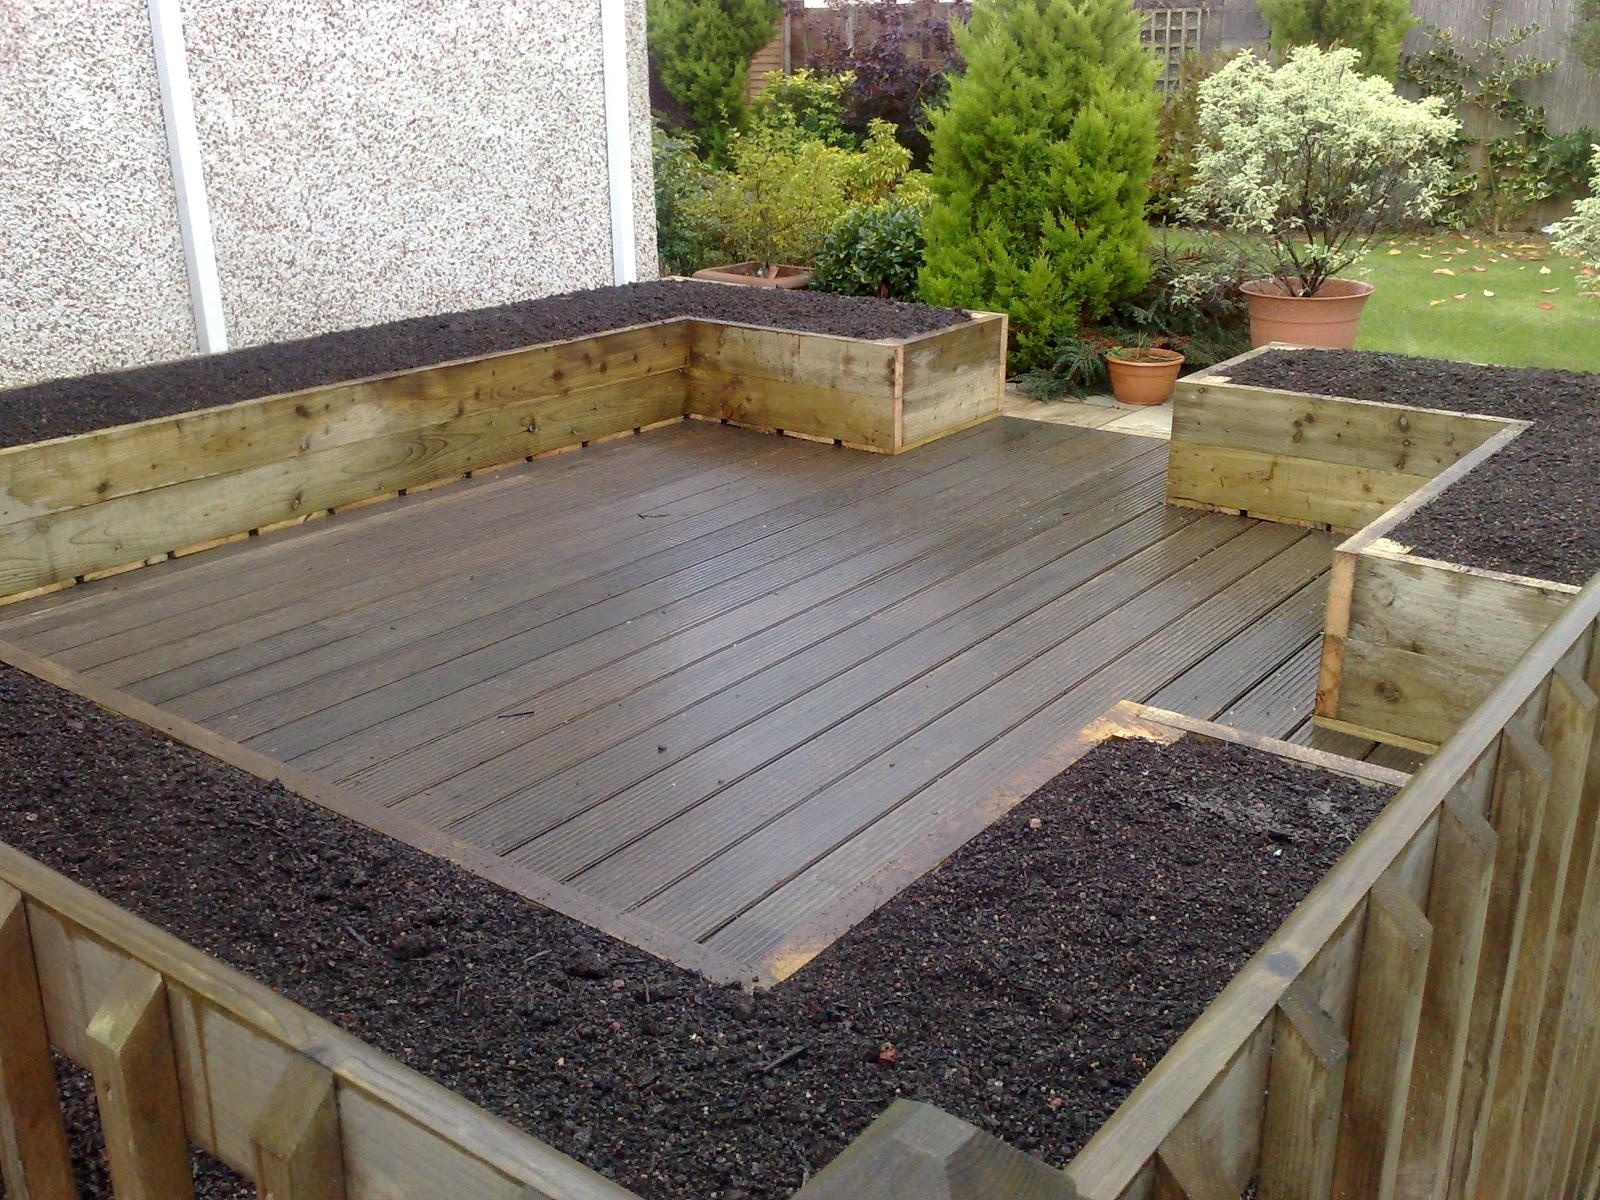 Patchworkveg gardeners vegetable growing website - Best mulch for raised bed vegetable garden ...